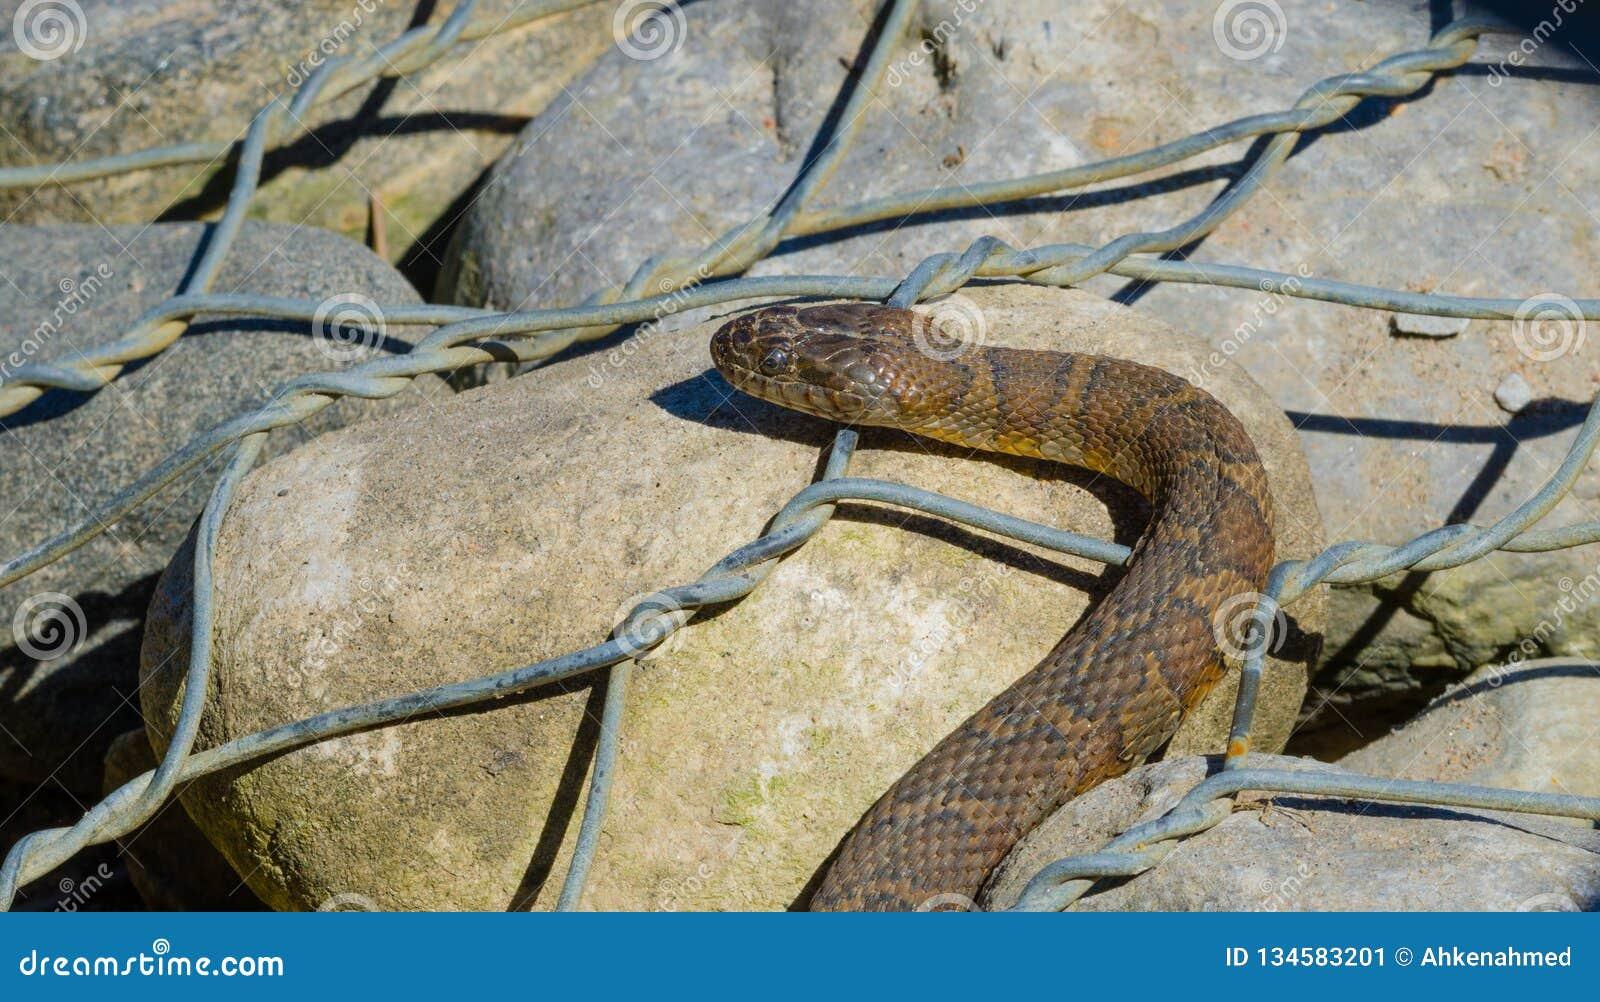 Northern water snake Nerodia sipedon.